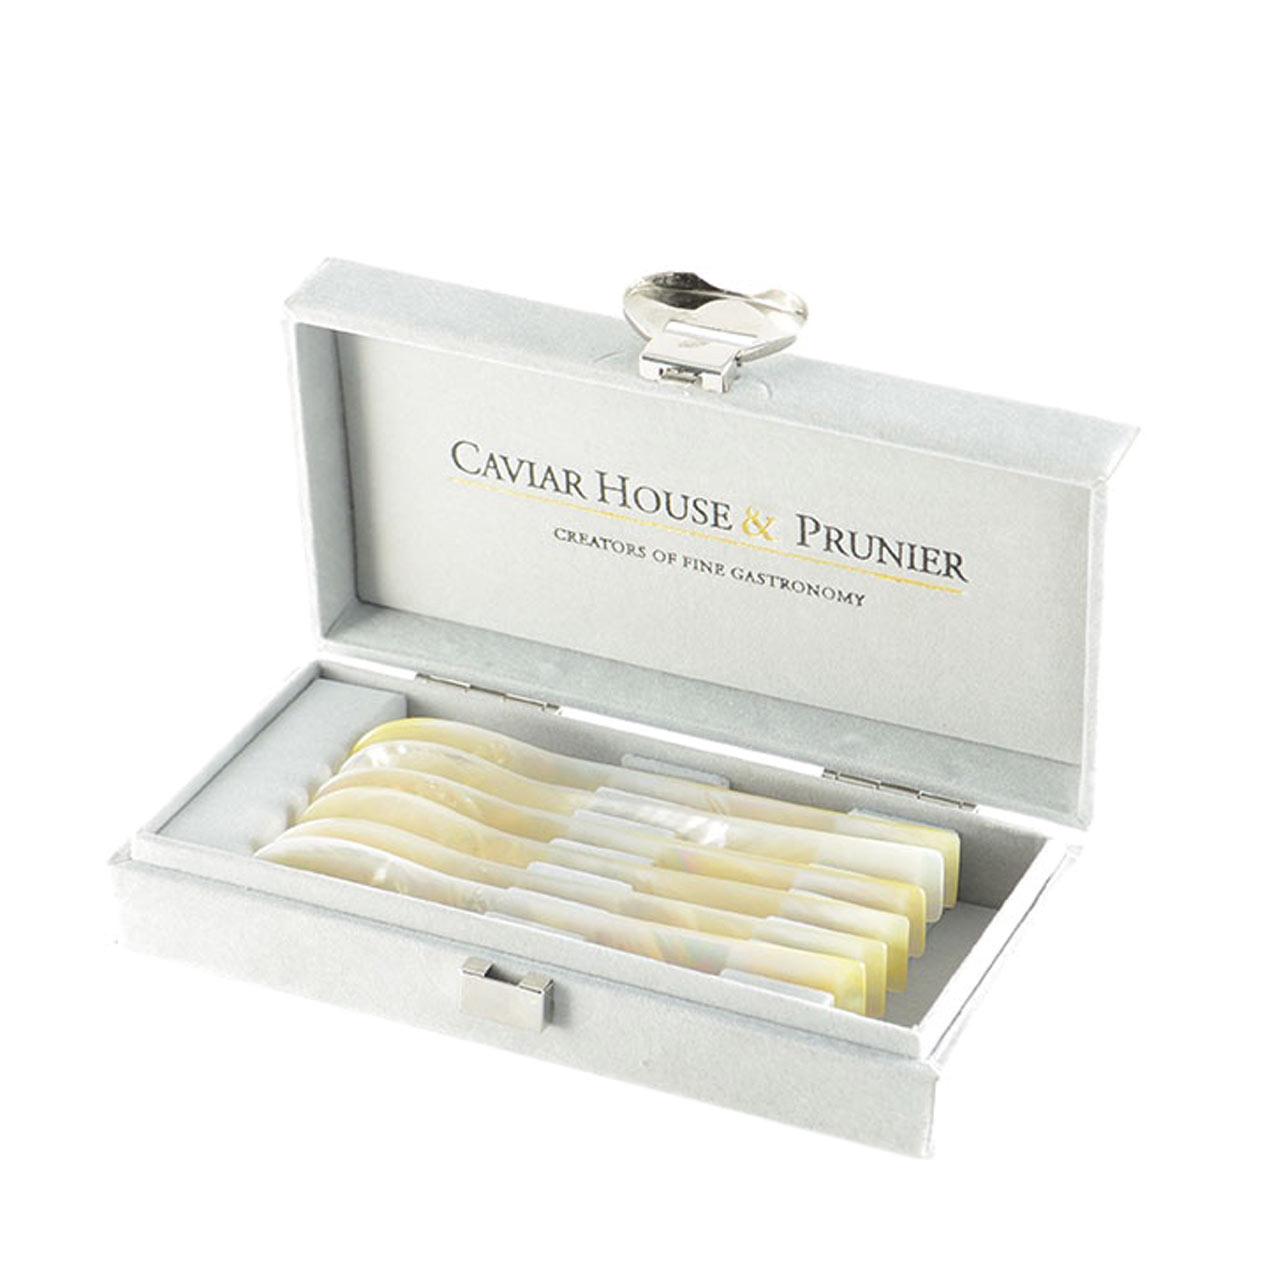 Caviar House & Prunier Perlmuttlöffel 6 Stück